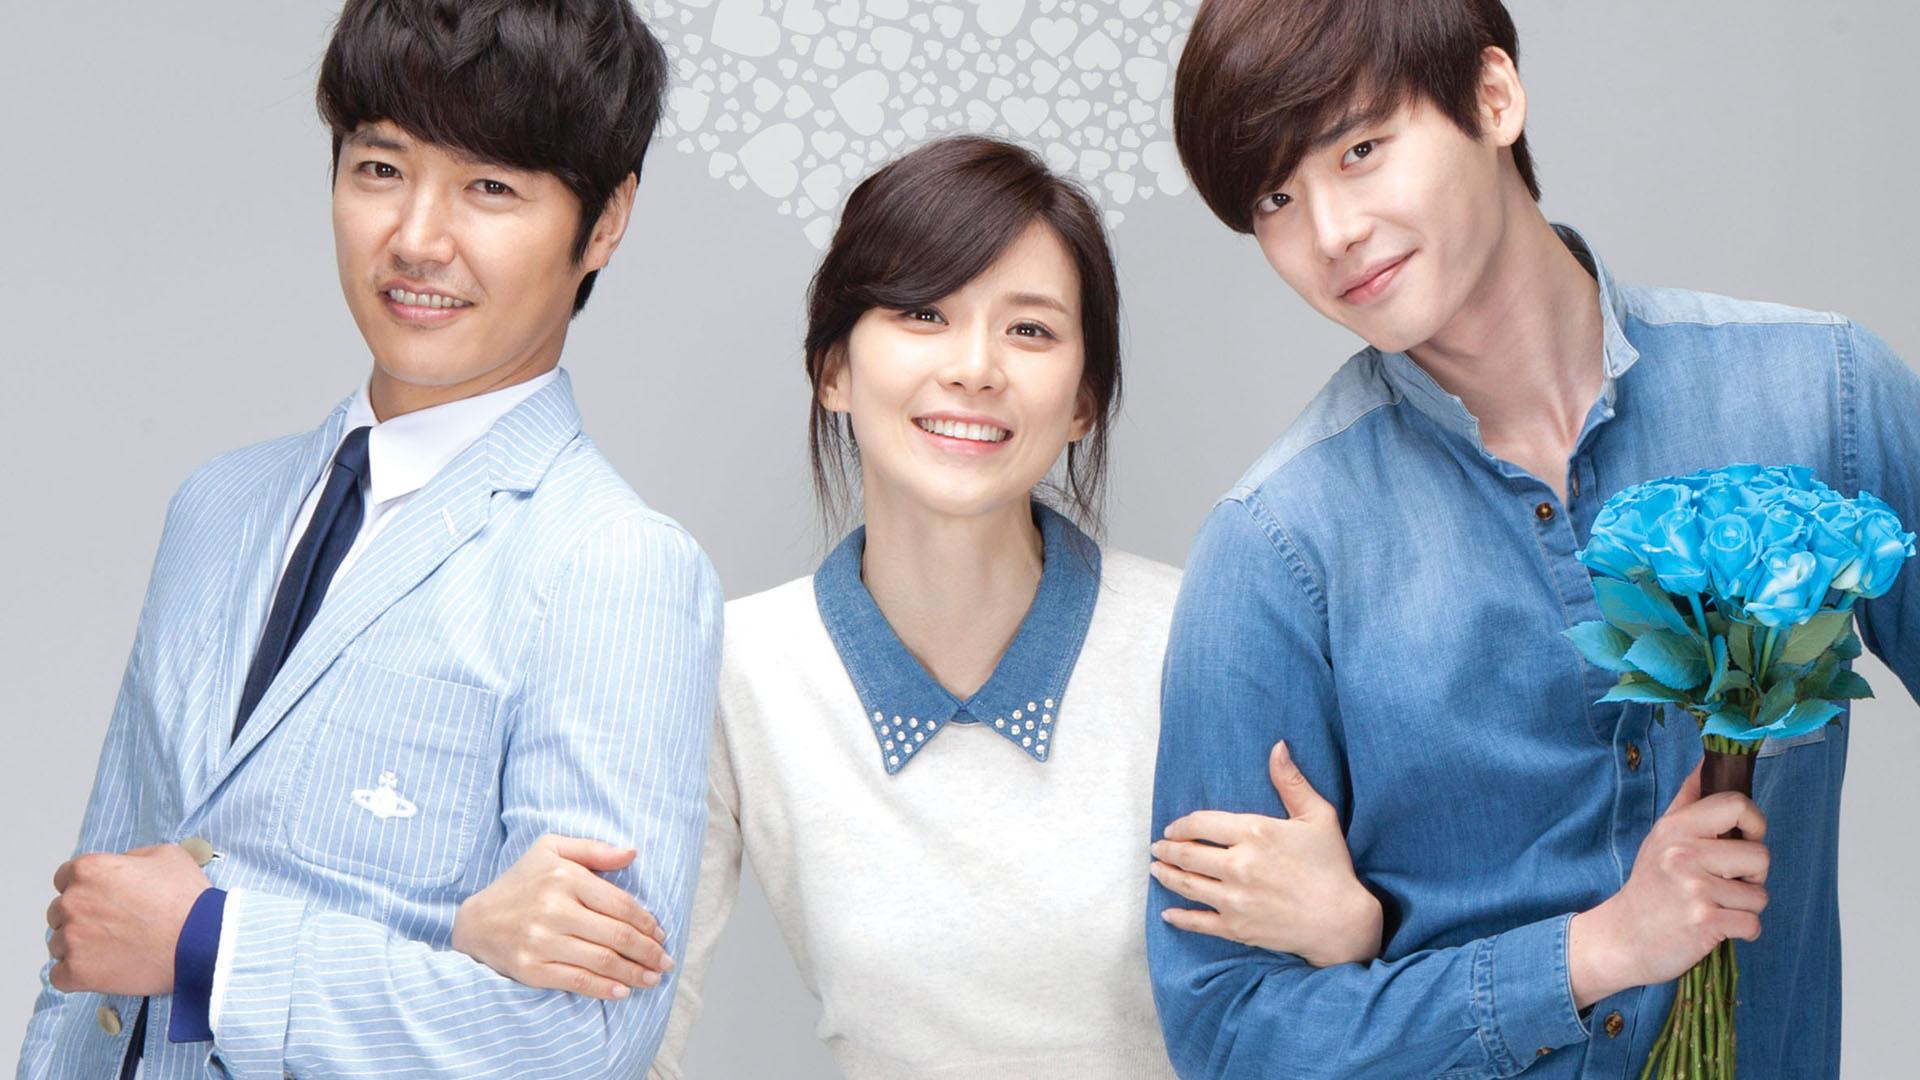 I_hear_your_voice_korean_dramas_35264405_1920_1080.jpg